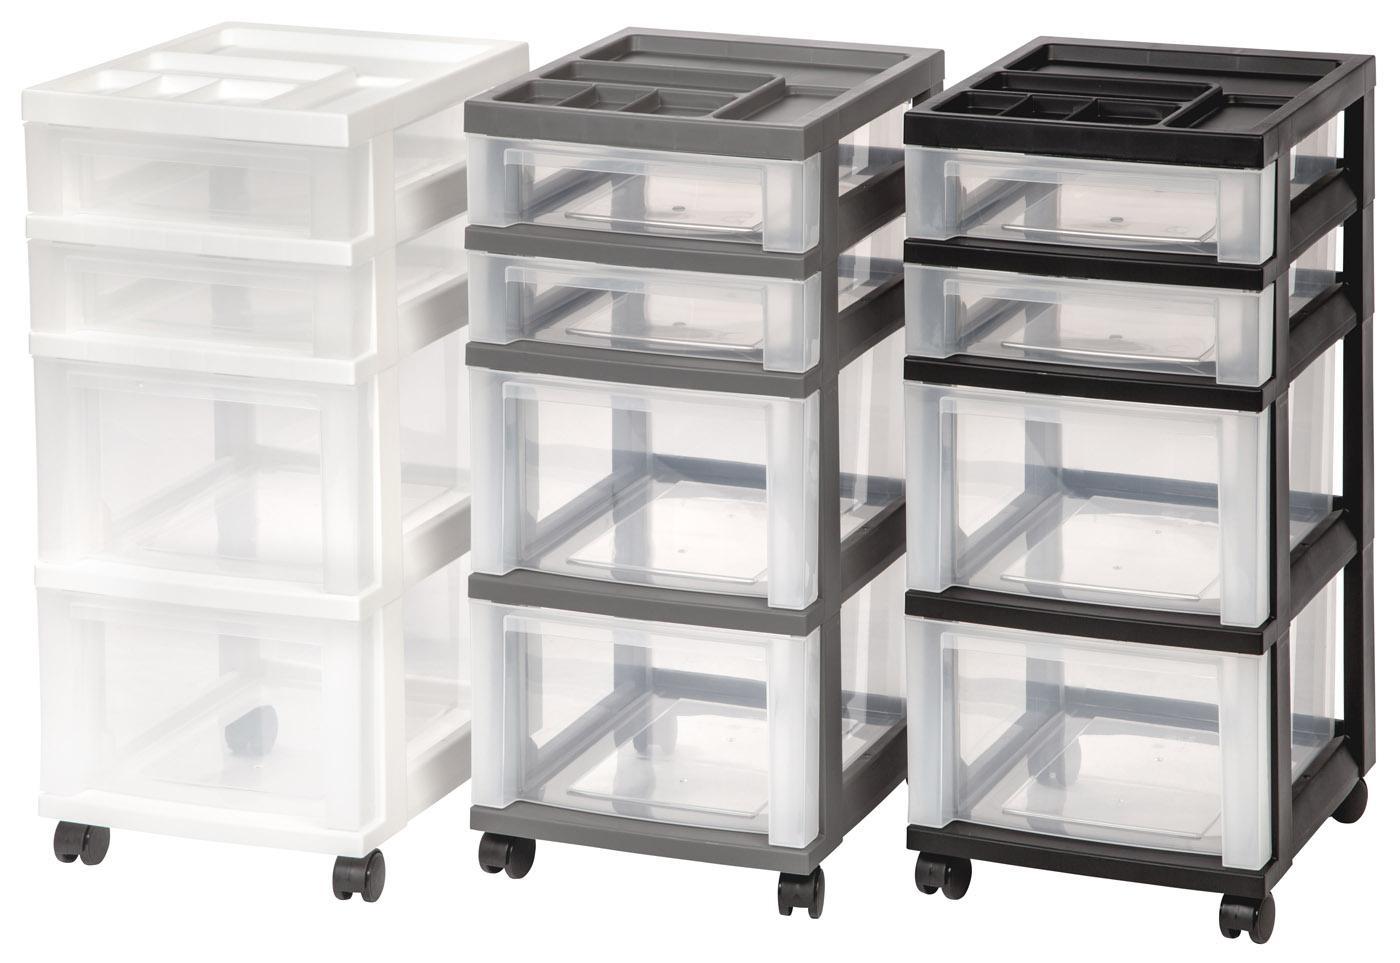 Amazon.com: IRIS 4-Drawer Storage Cart With Organizer Top